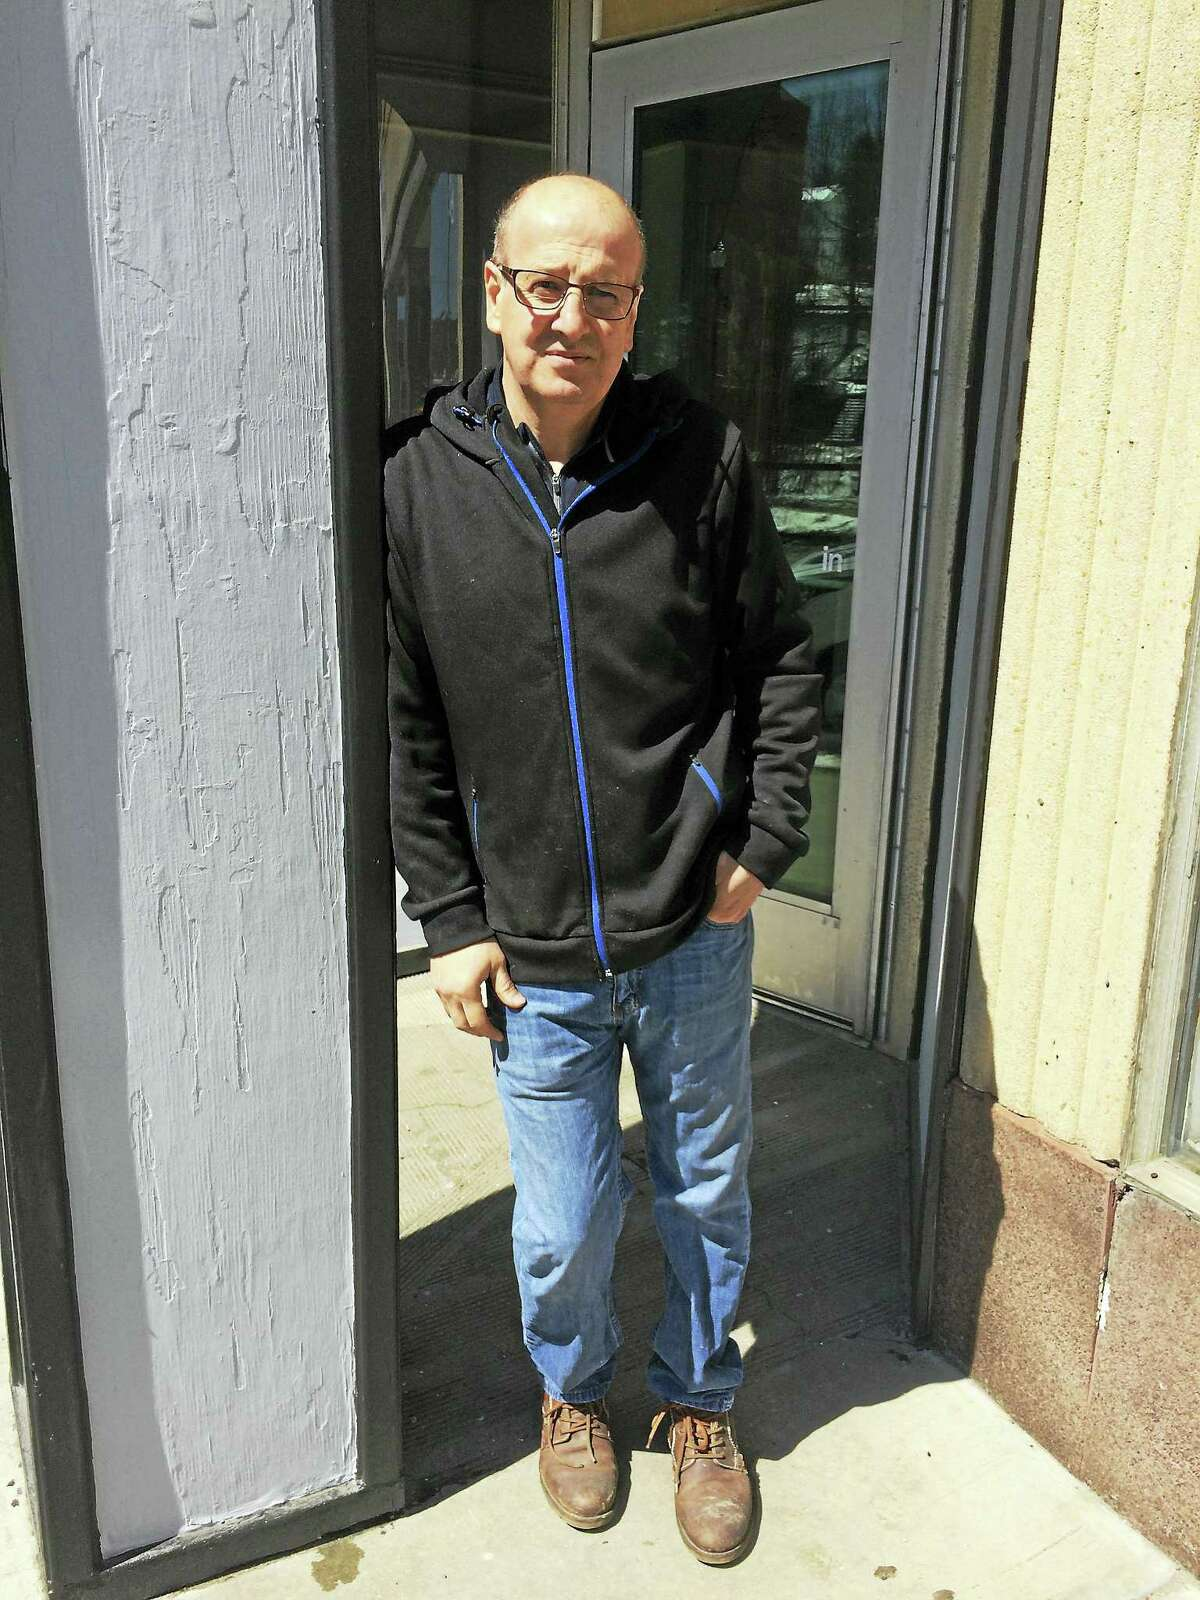 George Noujaim is opening a Mediterranean restaurant in Winsted.